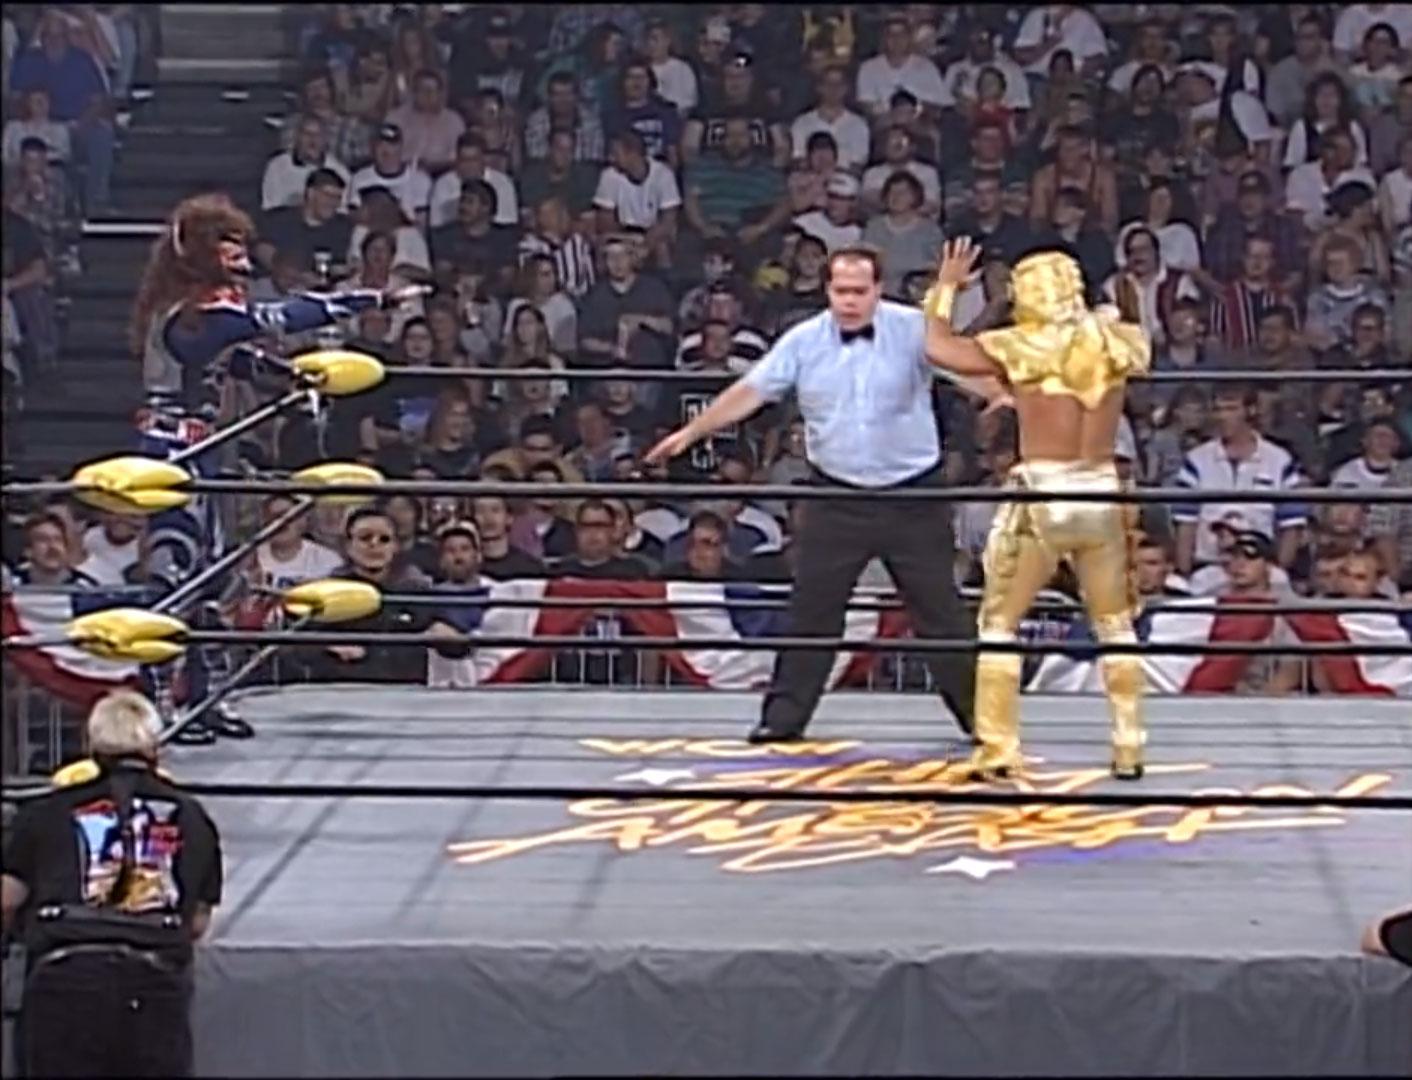 Ultimo Dragon vs. Psychosis WCW Great American Bash '97 Jun 15th 1997